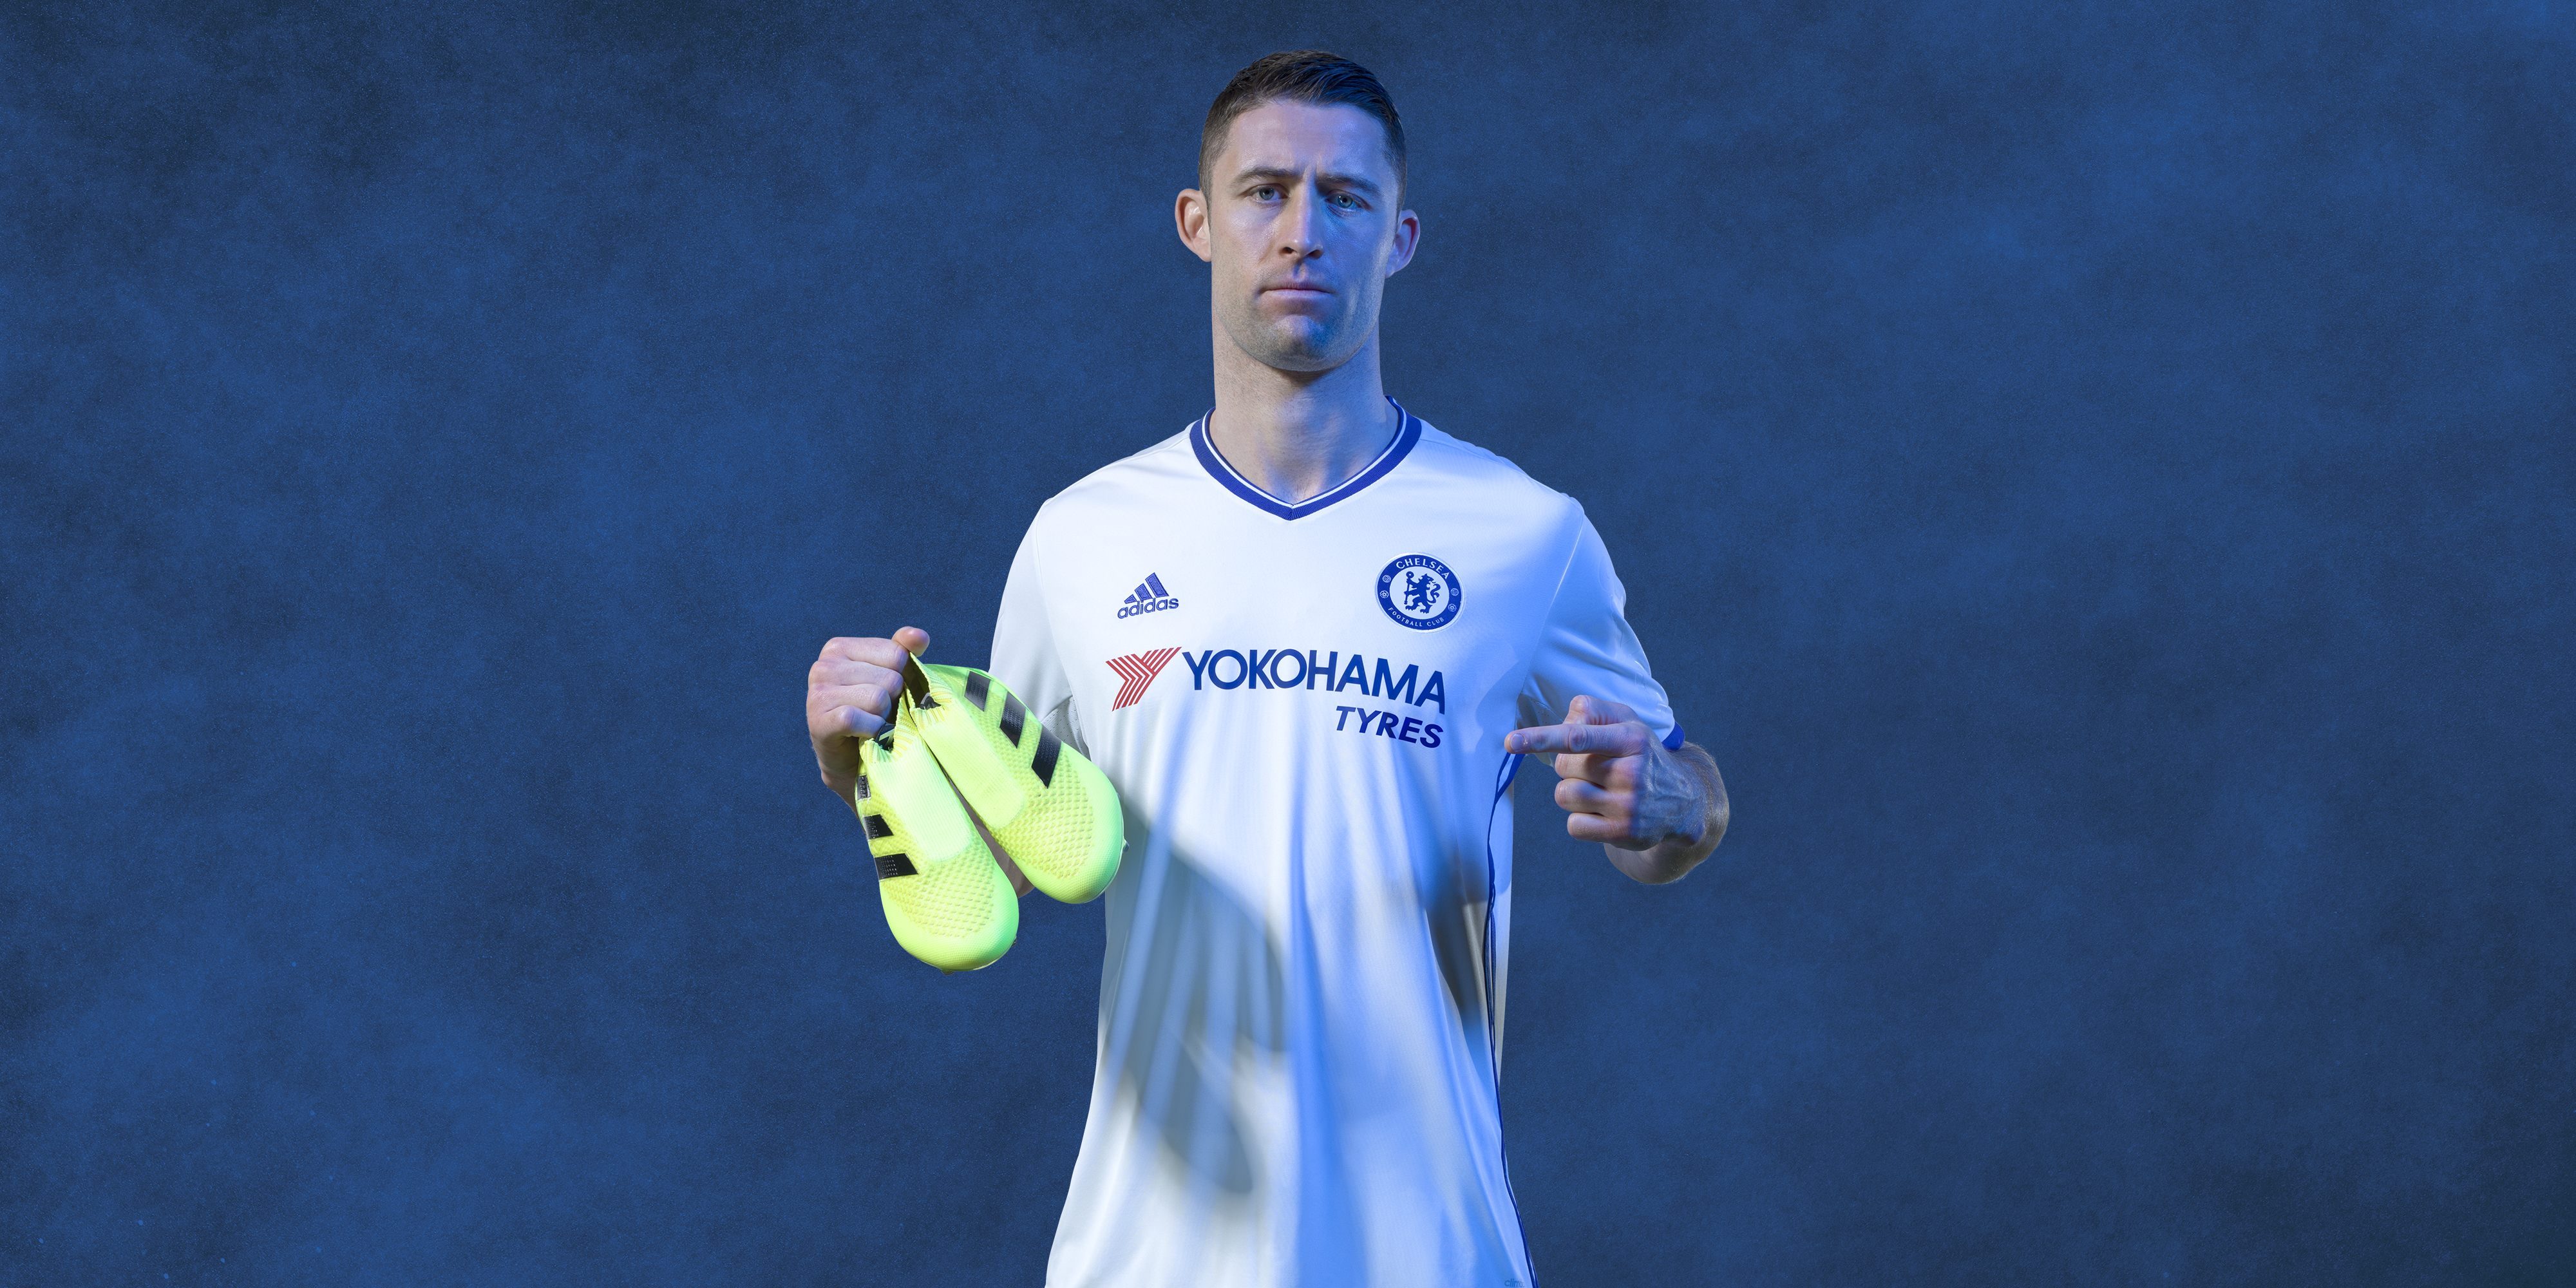 Chelsea_16-17_Kit_PR_THIRD_Cahill